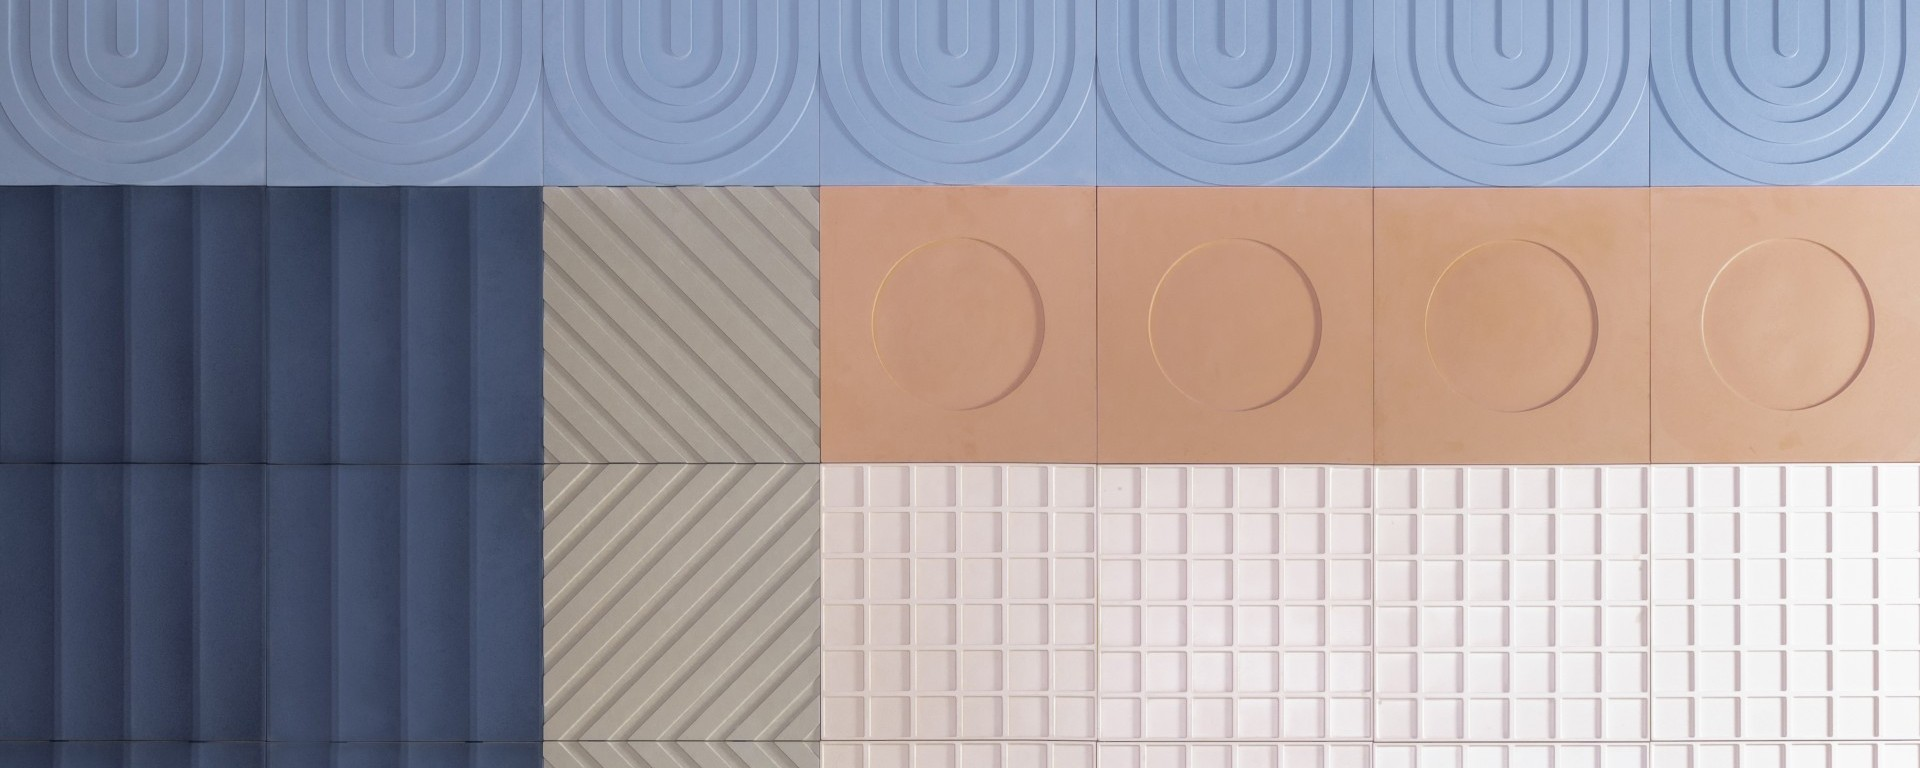 Kaza Concrete Diverge collection Aimee Munro 3d tile